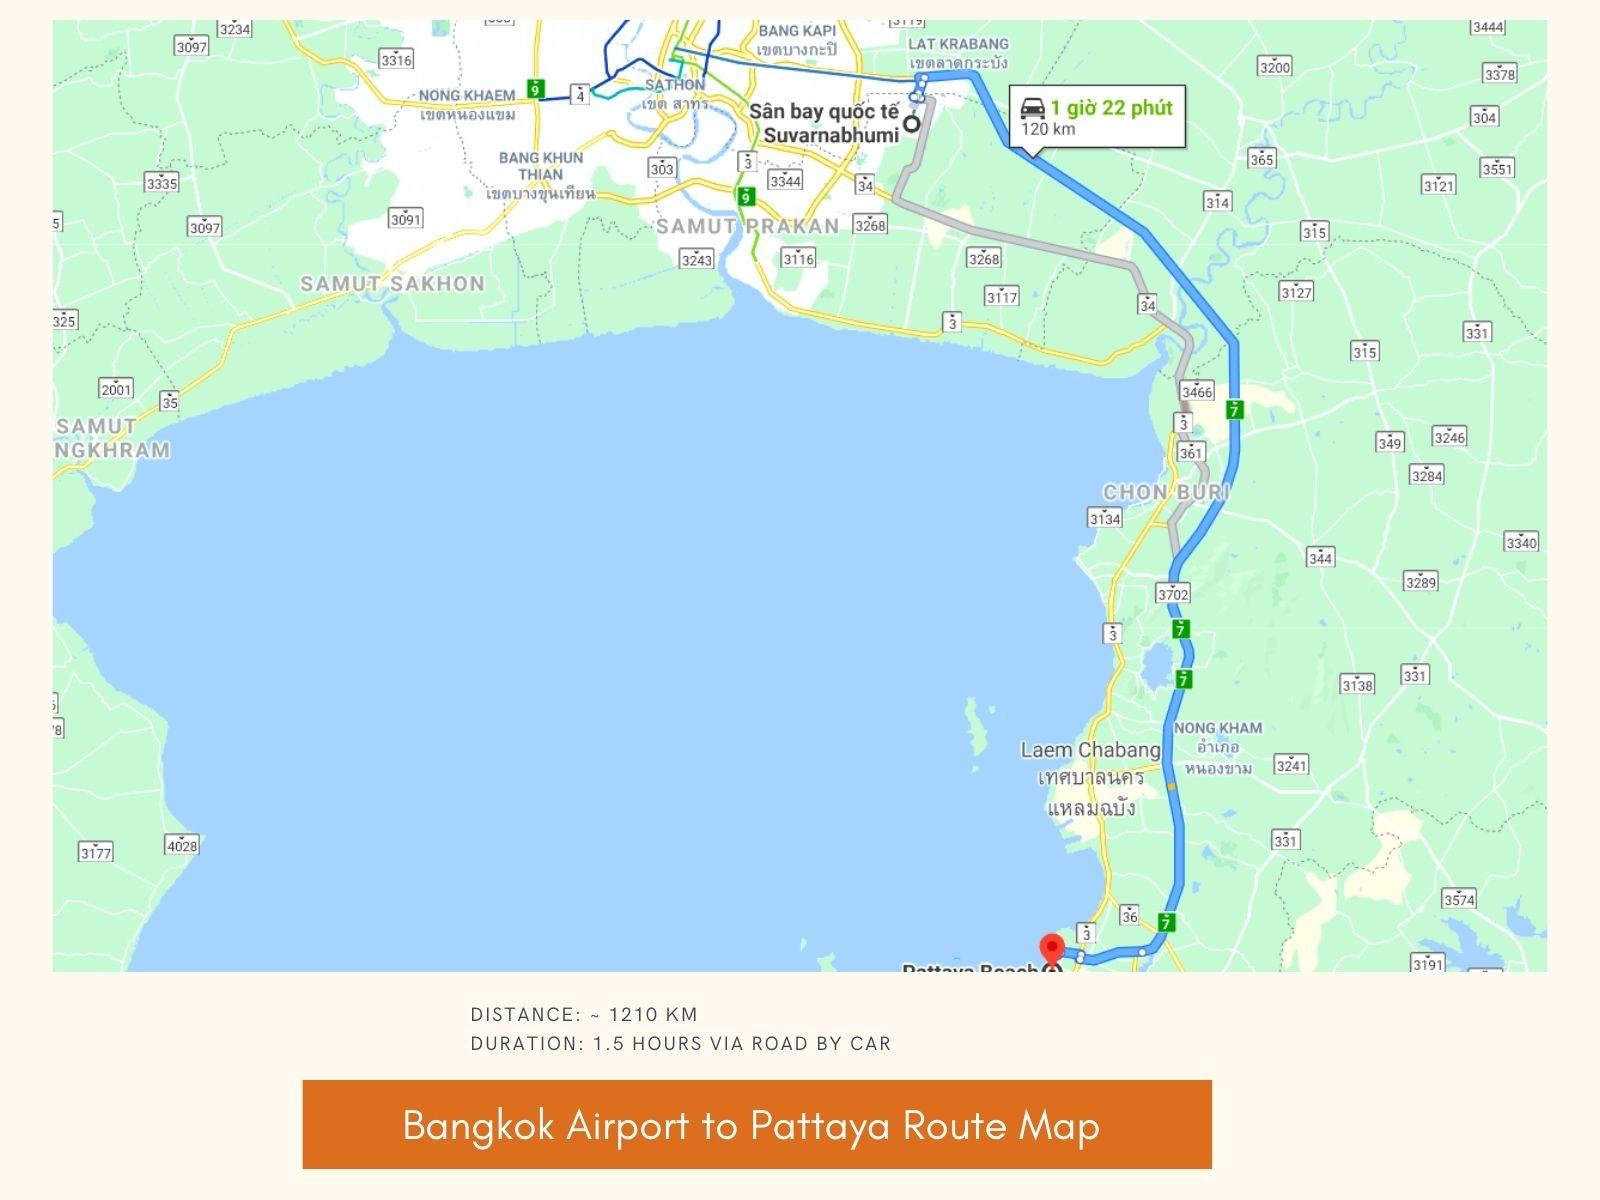 Bangkok Airport to Pattaya travel time & duration